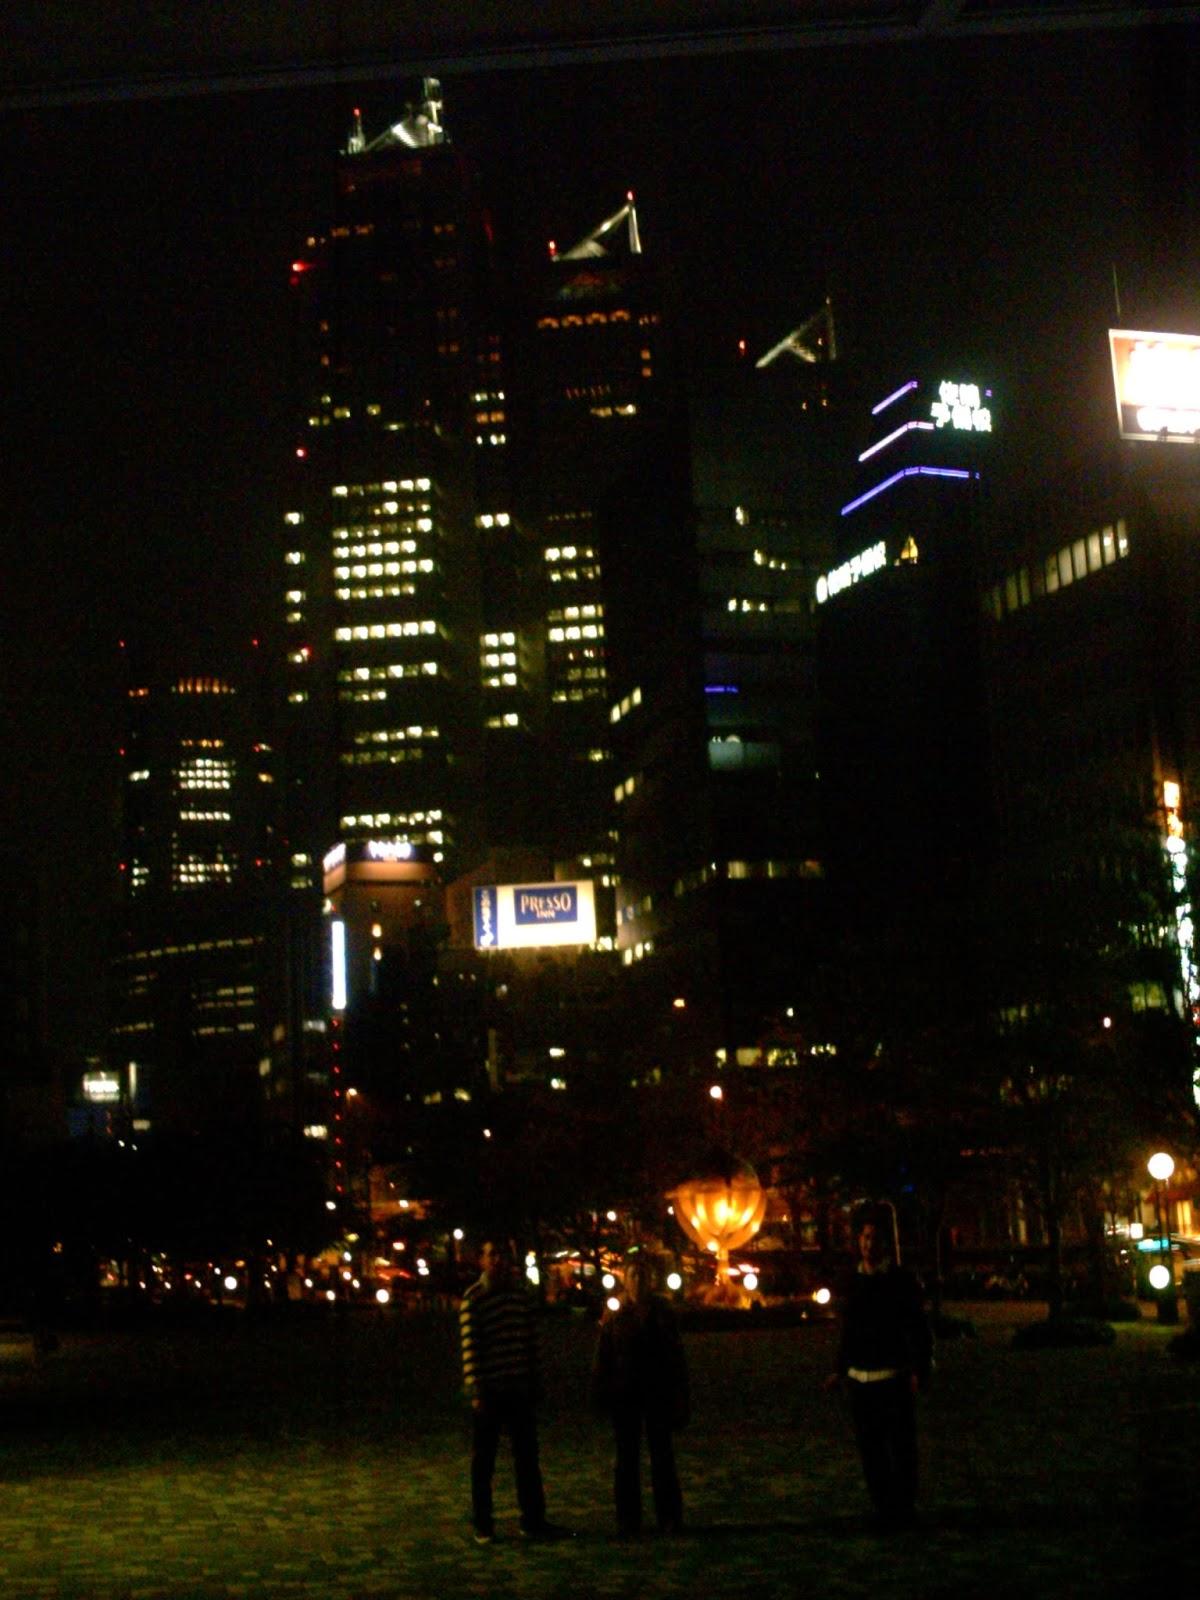 Shinjuku: Park Hyatt de Tokio (Tokyo), Japon